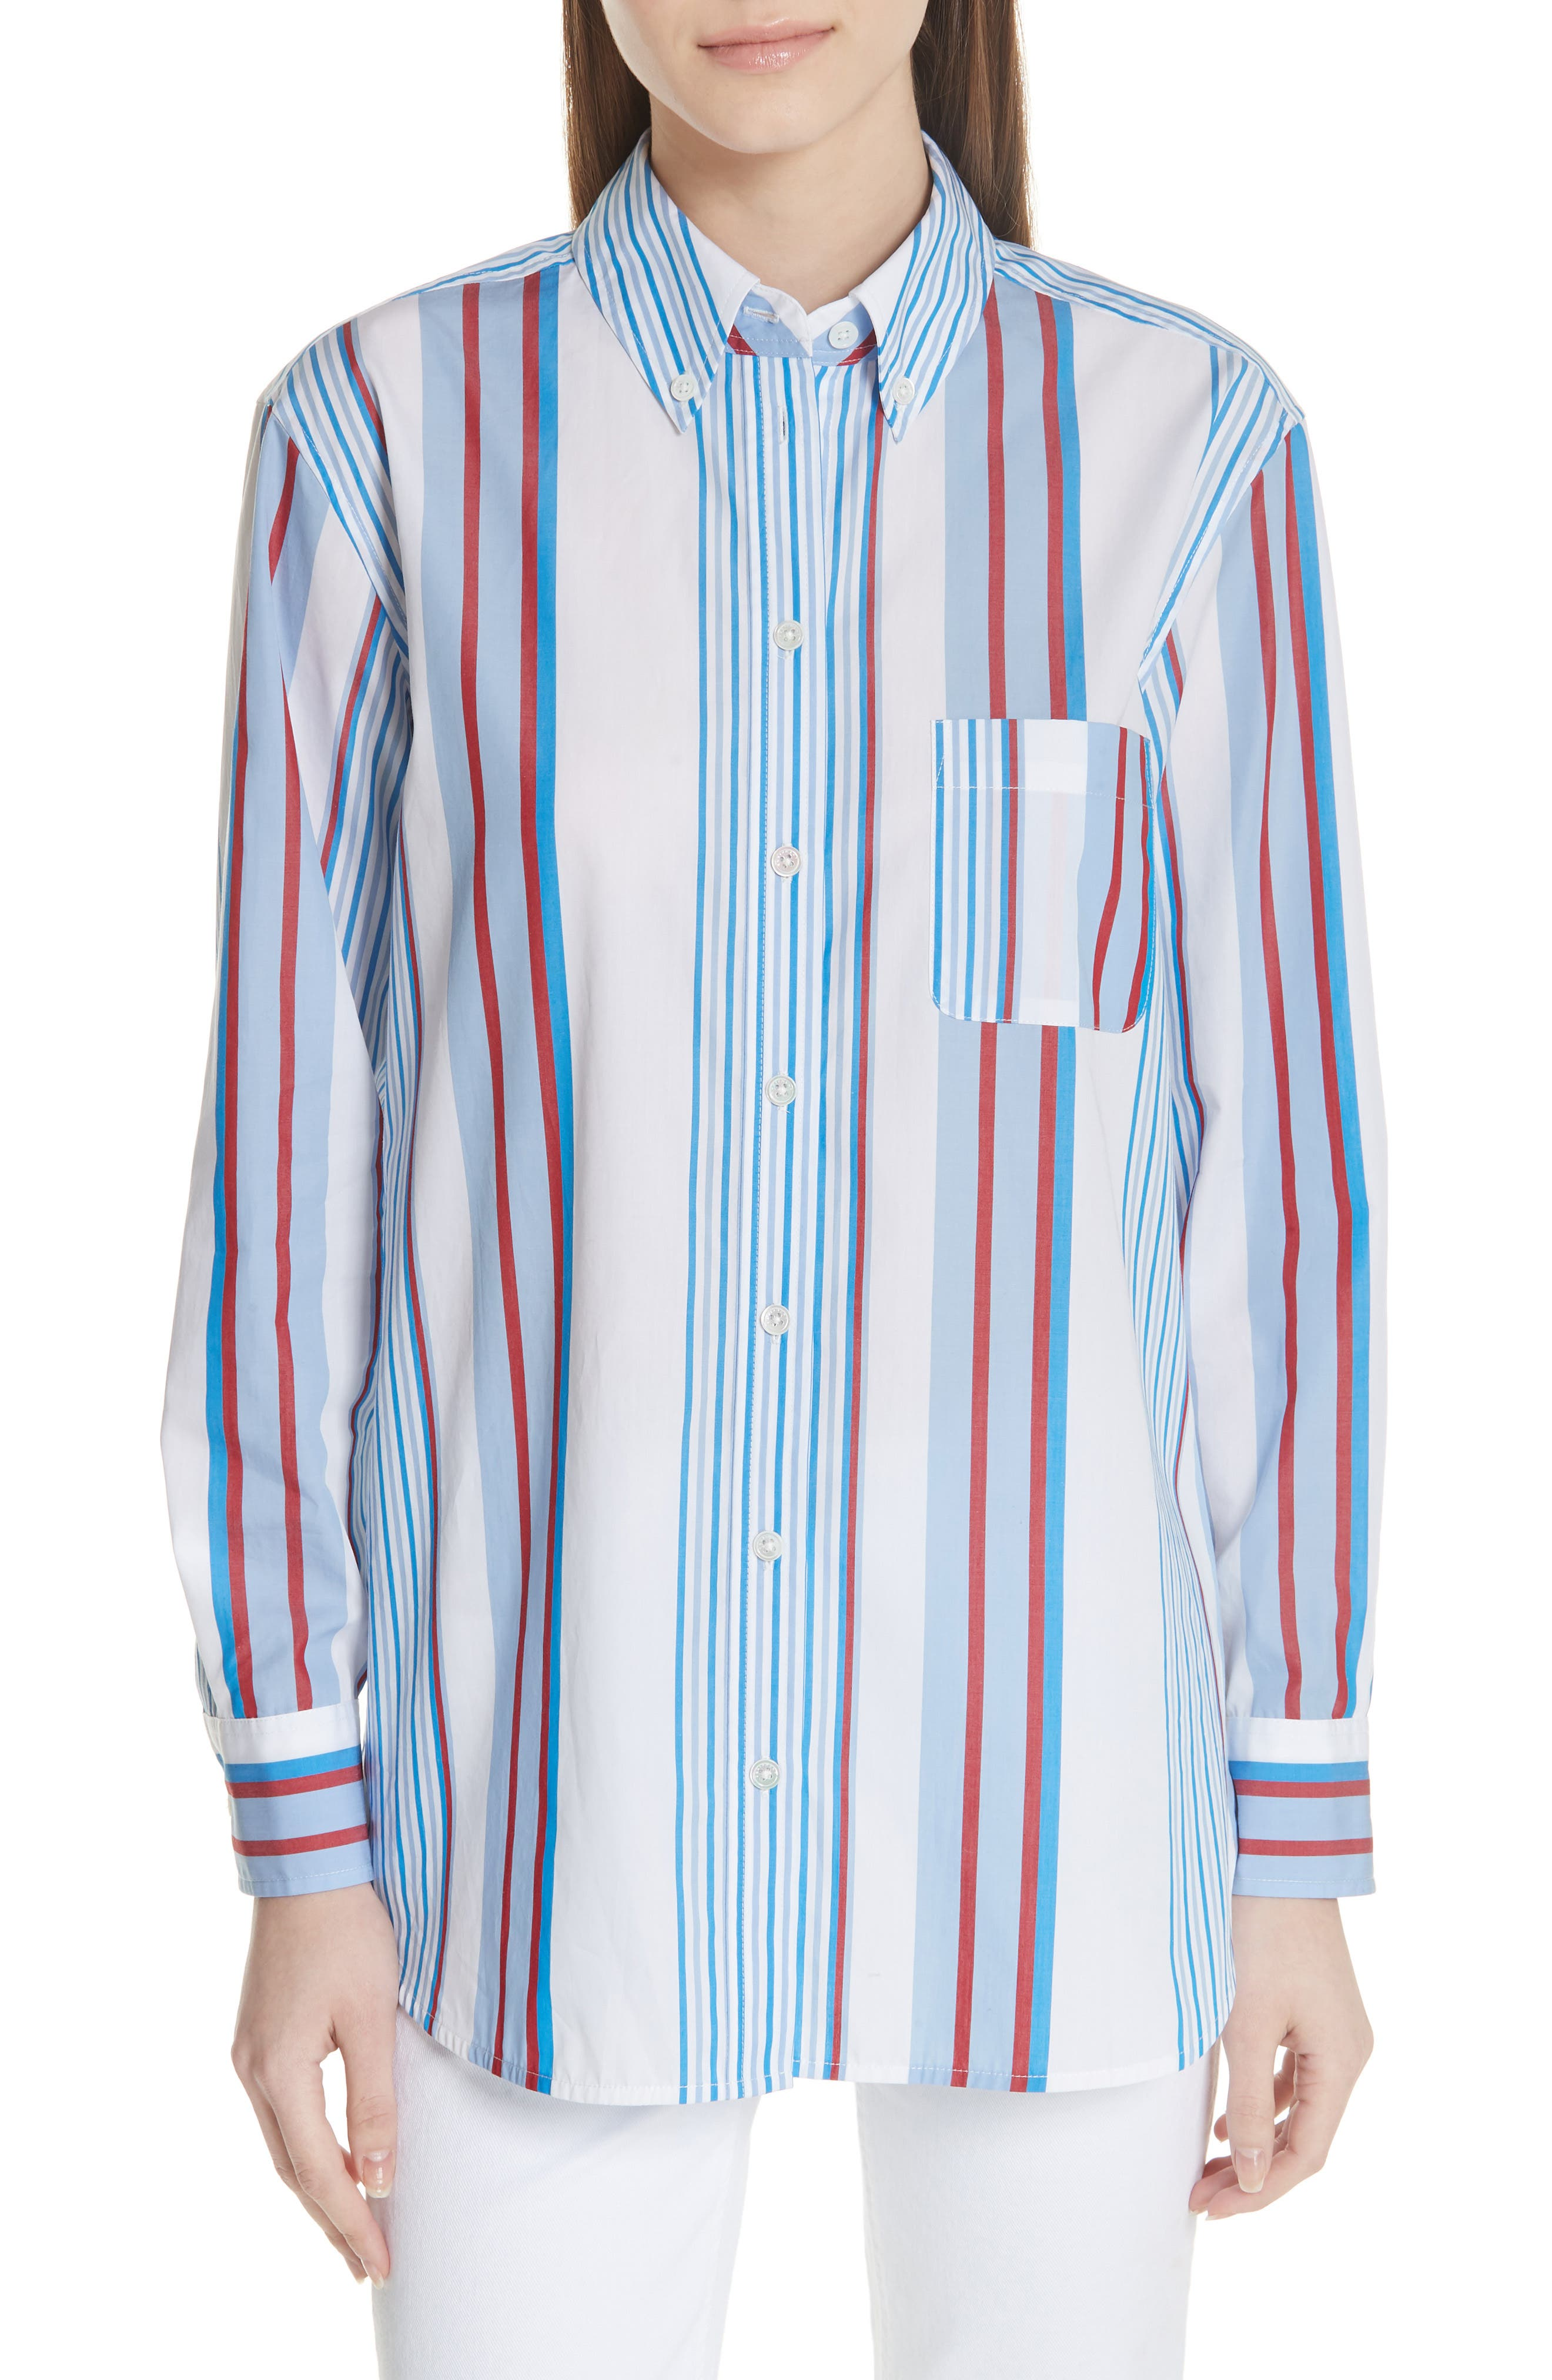 Margaux Stripe Shirt,                             Main thumbnail 1, color,                             BLUE WHITE MULTI